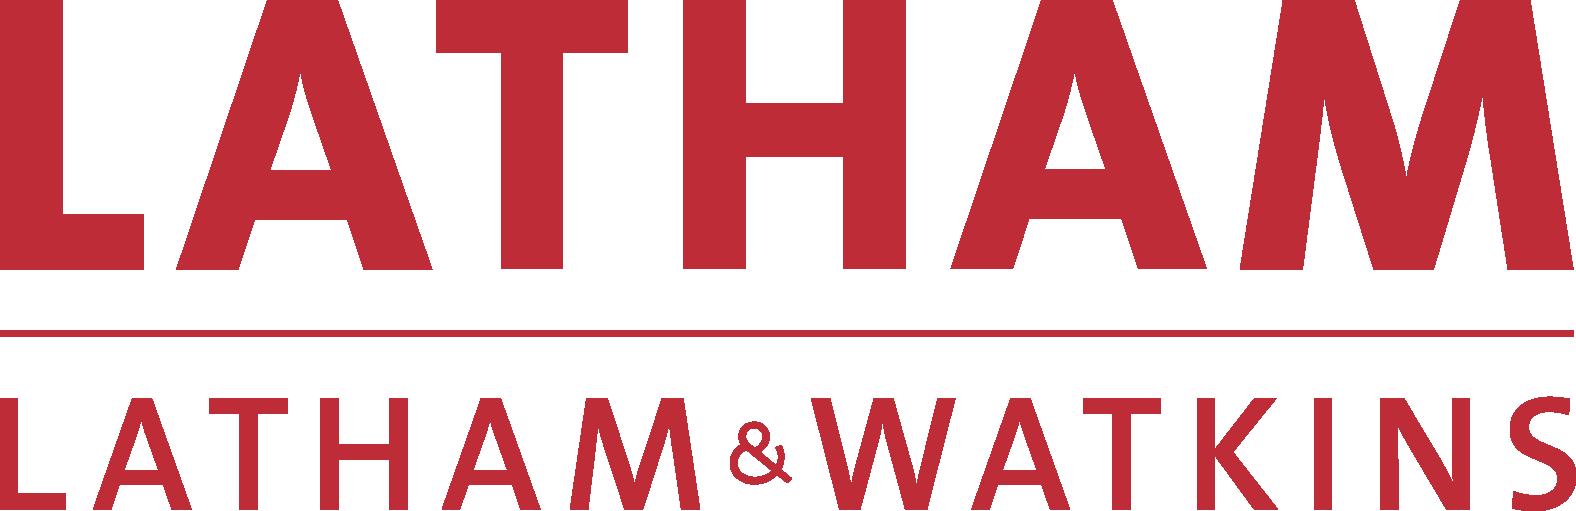 LW_Sponsorships (4).png